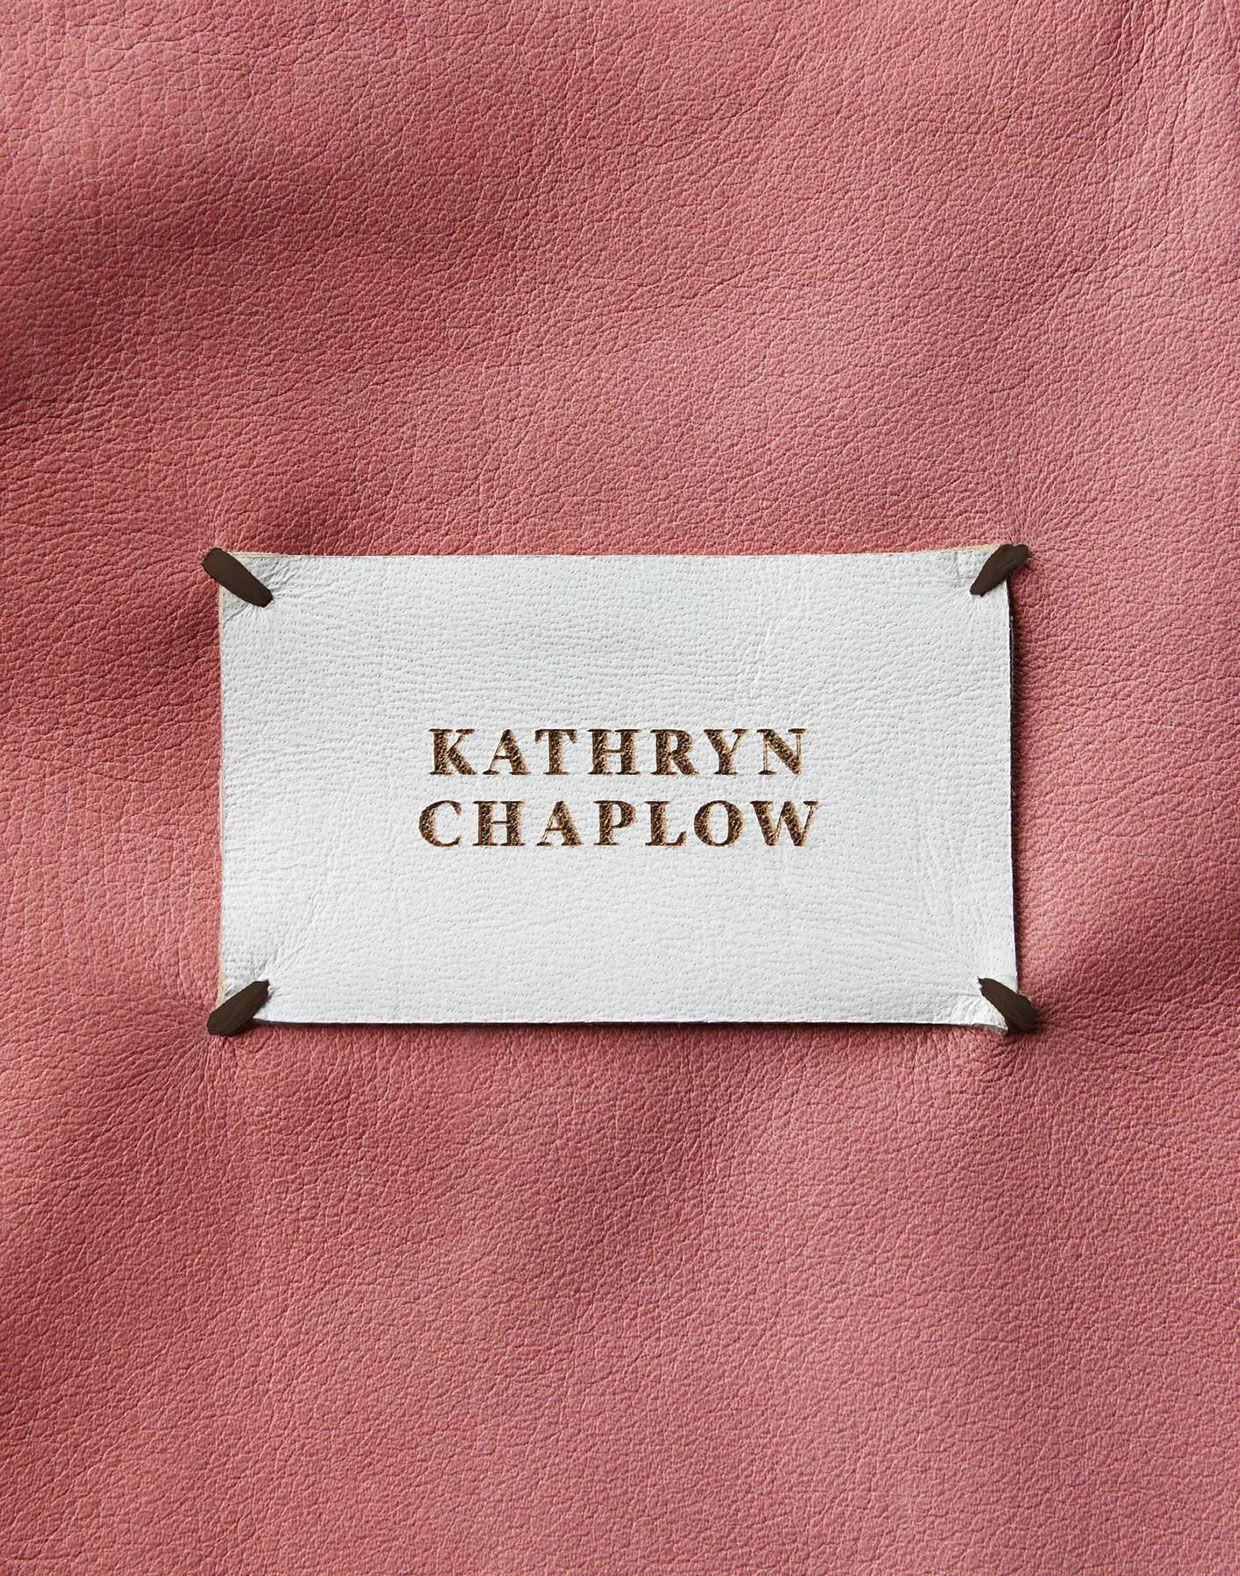 Kathryn Chaplow branding Clothing brand logos, Fashion